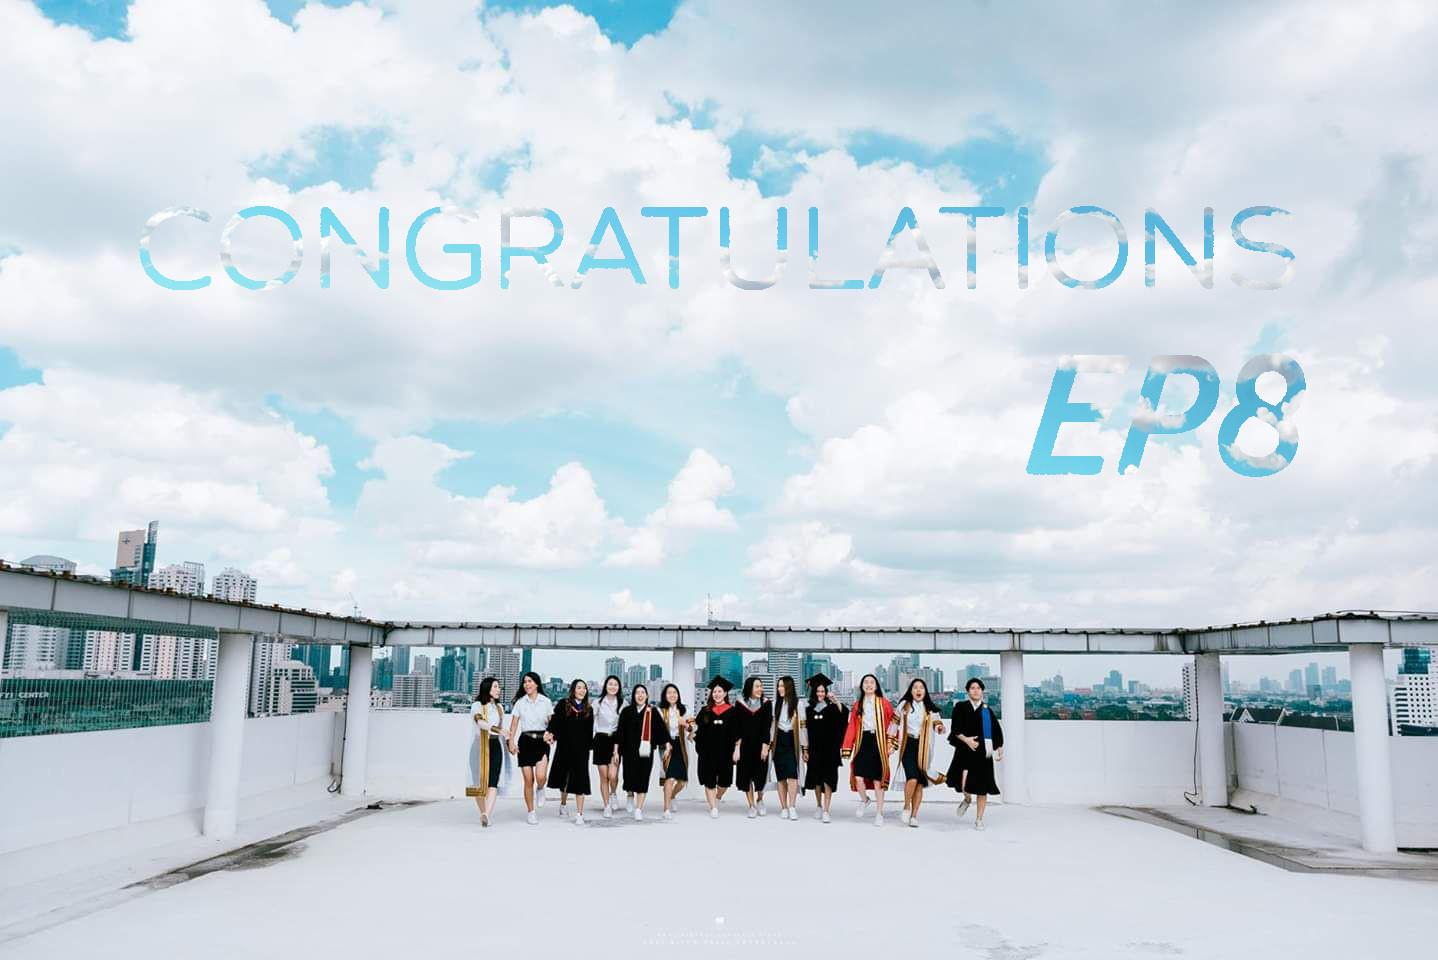 Congratulations EP8